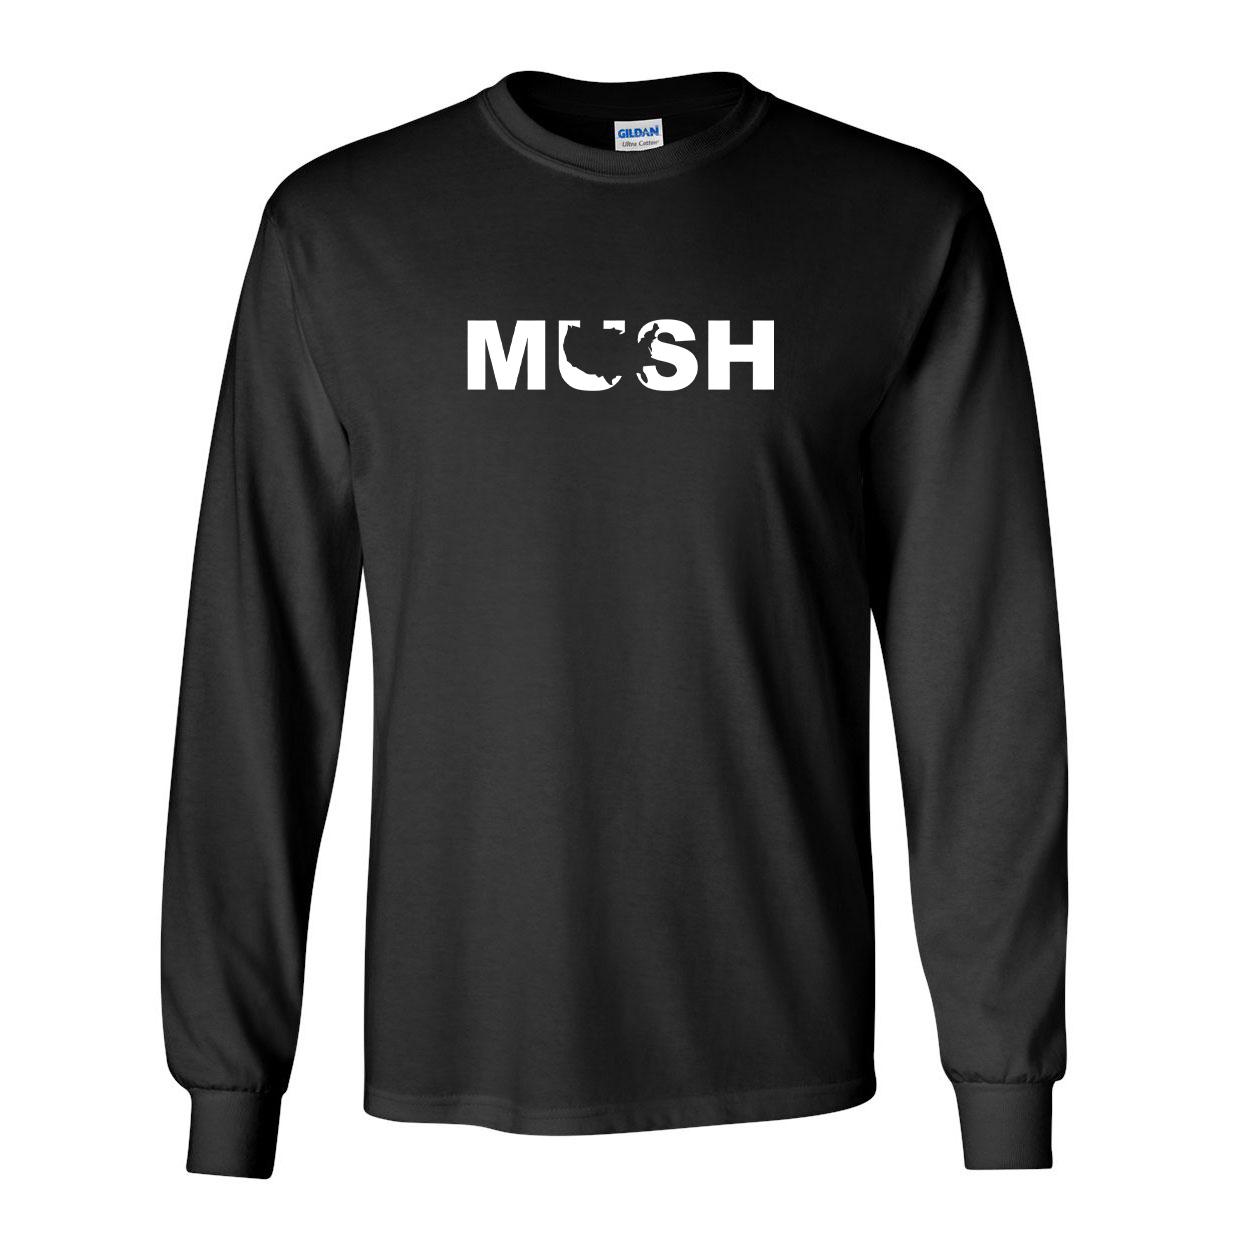 Mush United States Classic Long Sleeve T-Shirt Black (White Logo)